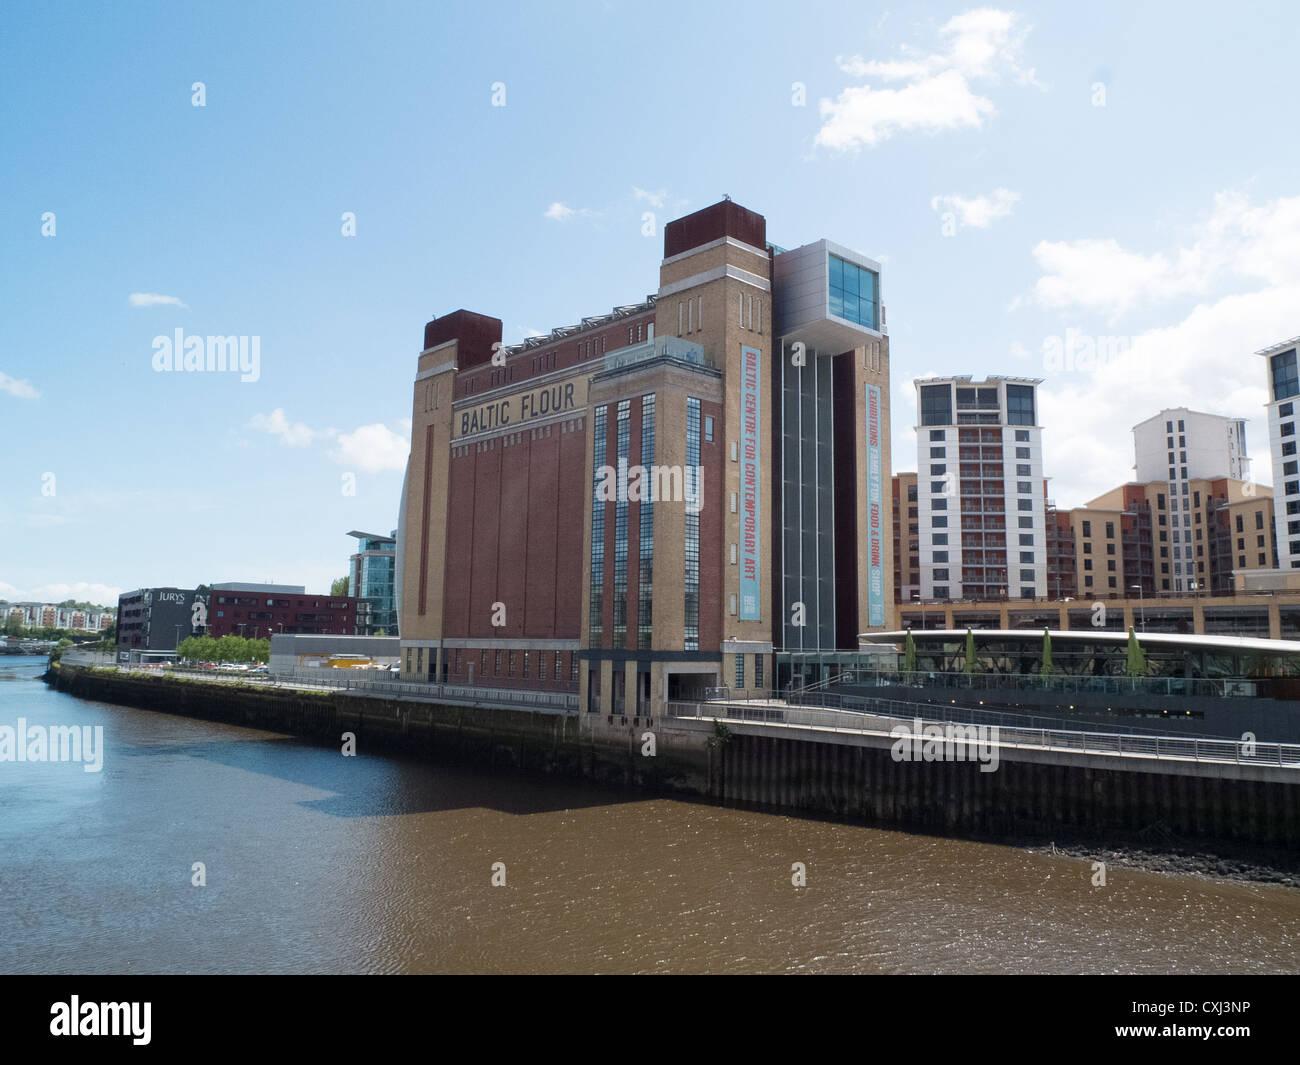 Baltic Centre center for Contemporary Art, flour mill, Newcastle - Stock Image